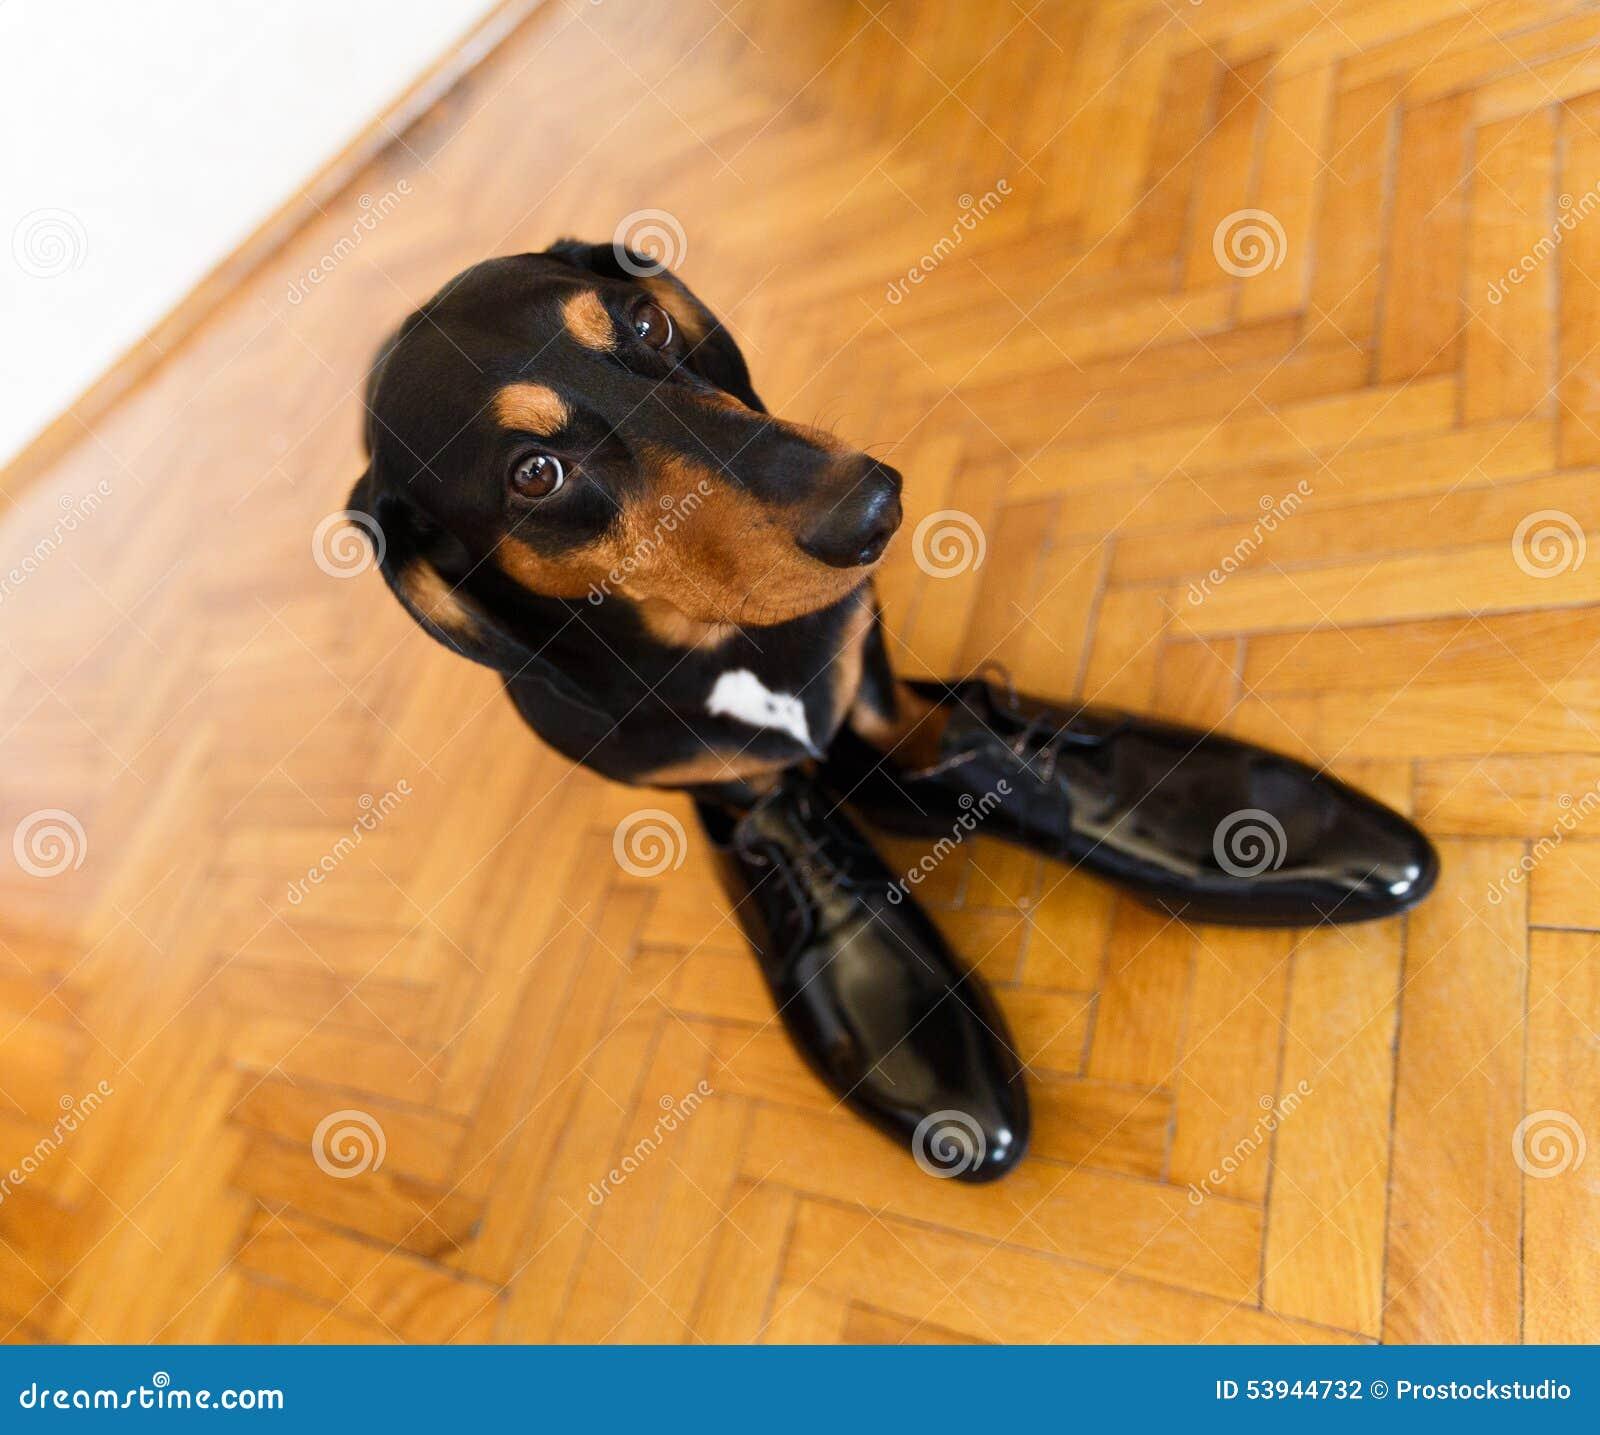 cane-elegante-del-bassotto-tedesco-scarp